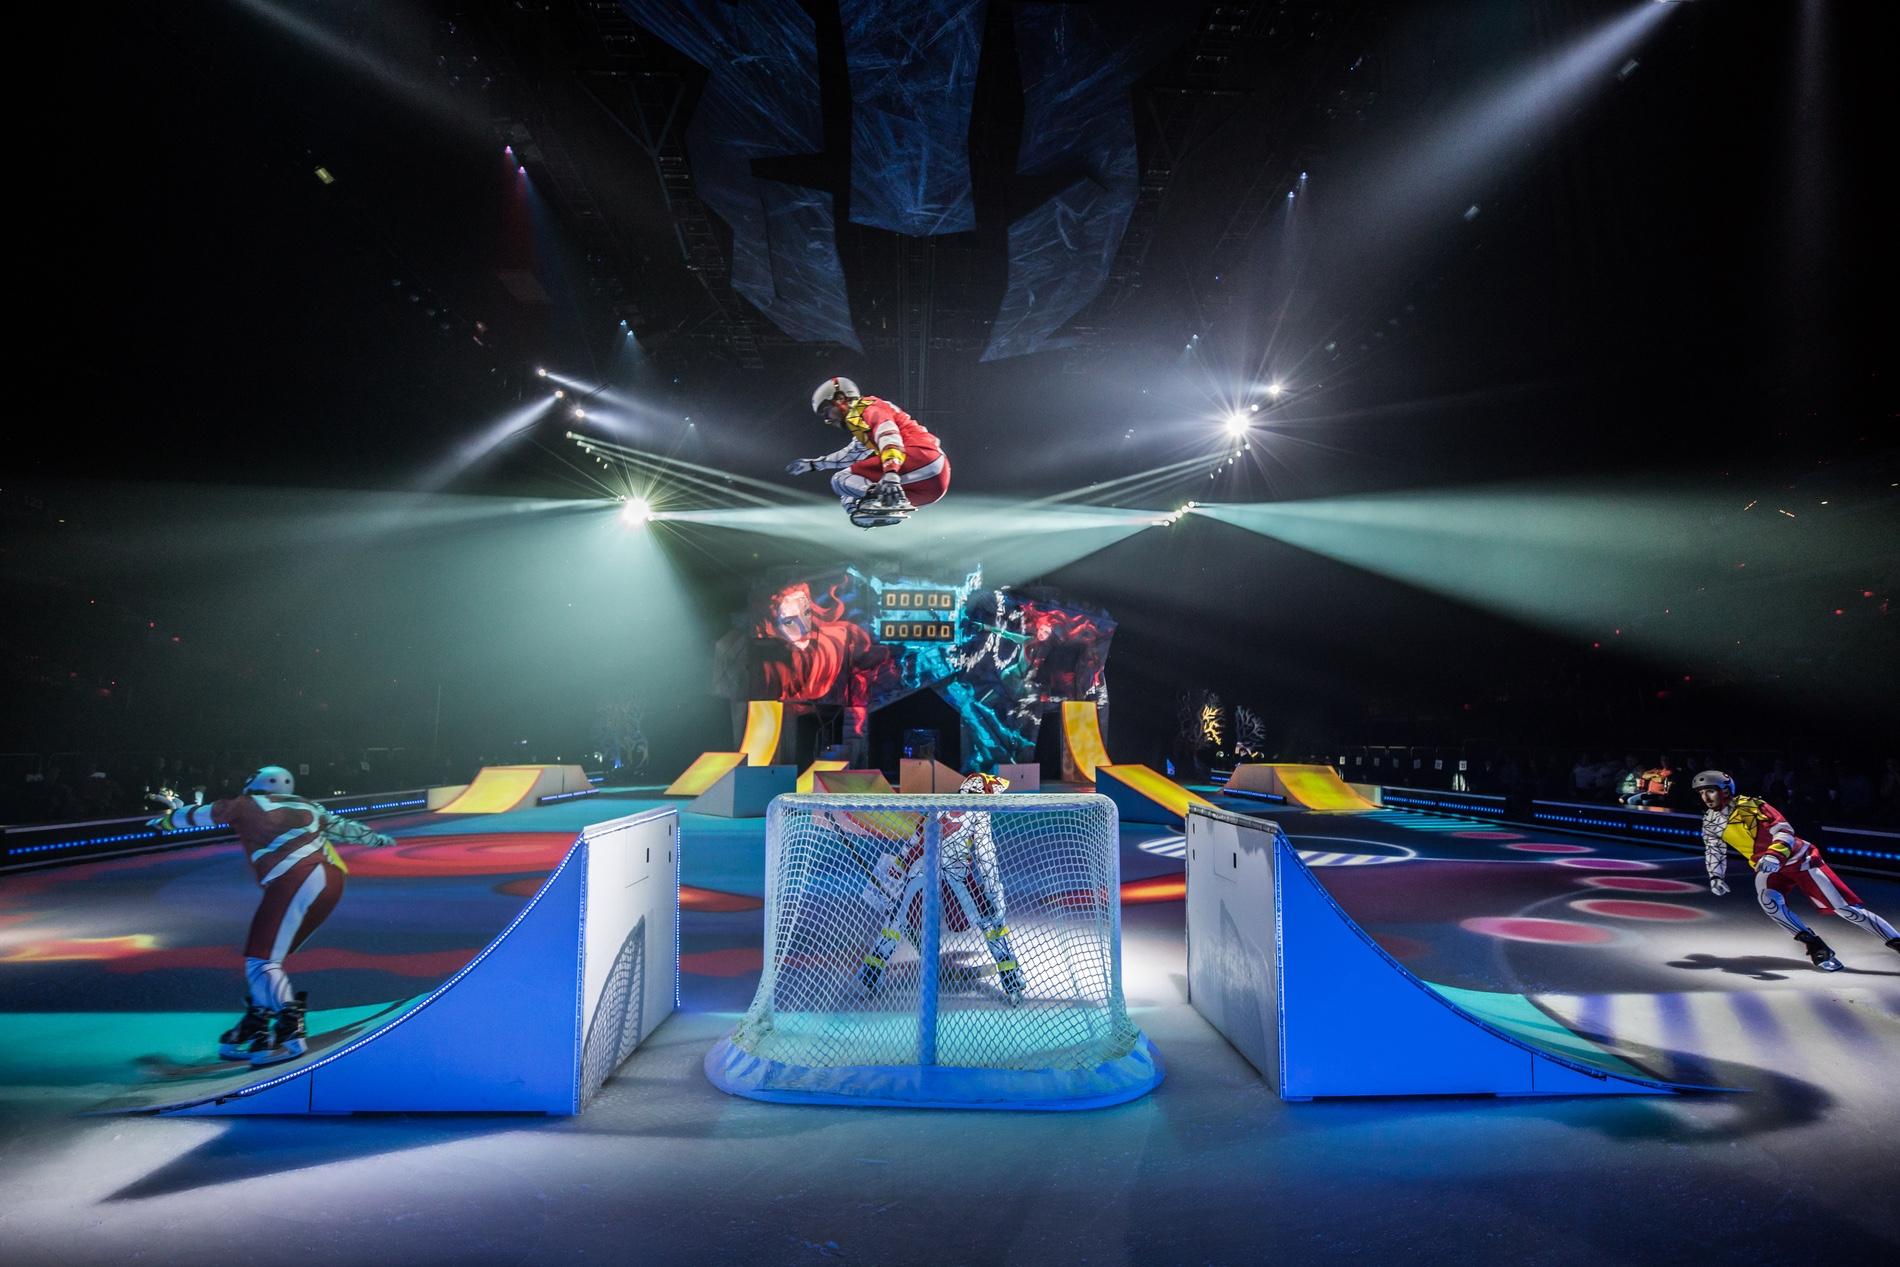 New Tucson 2018 >> Cirque du Soleil Crystal Review and Tour Dates – VIE Magazine